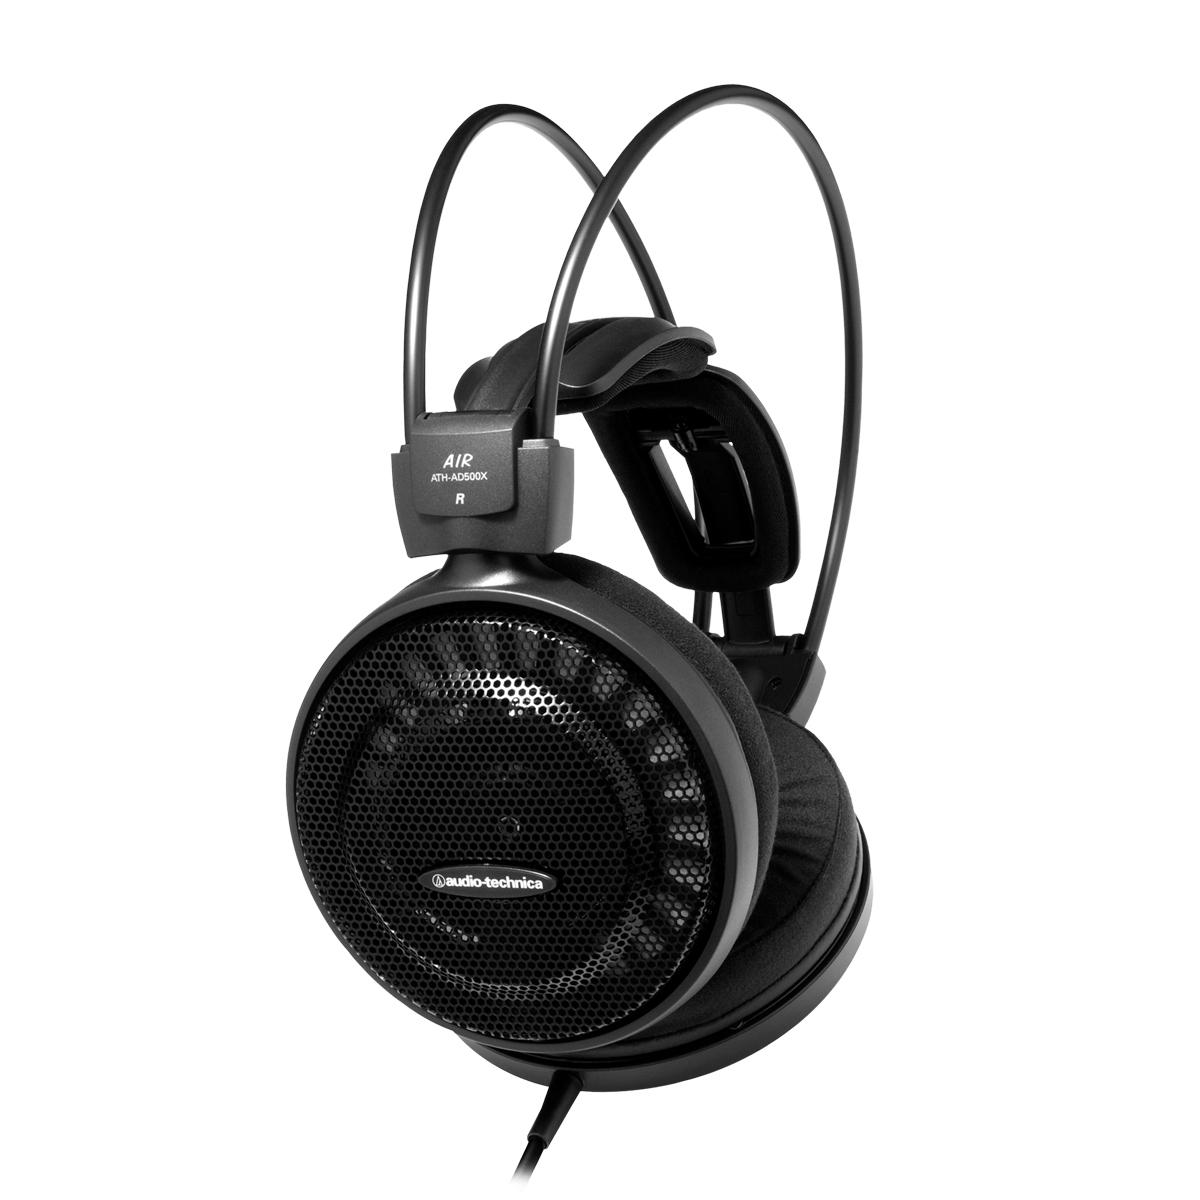 Audio Technica ATH AD500X offener High-Fidelity-Kopfhörer